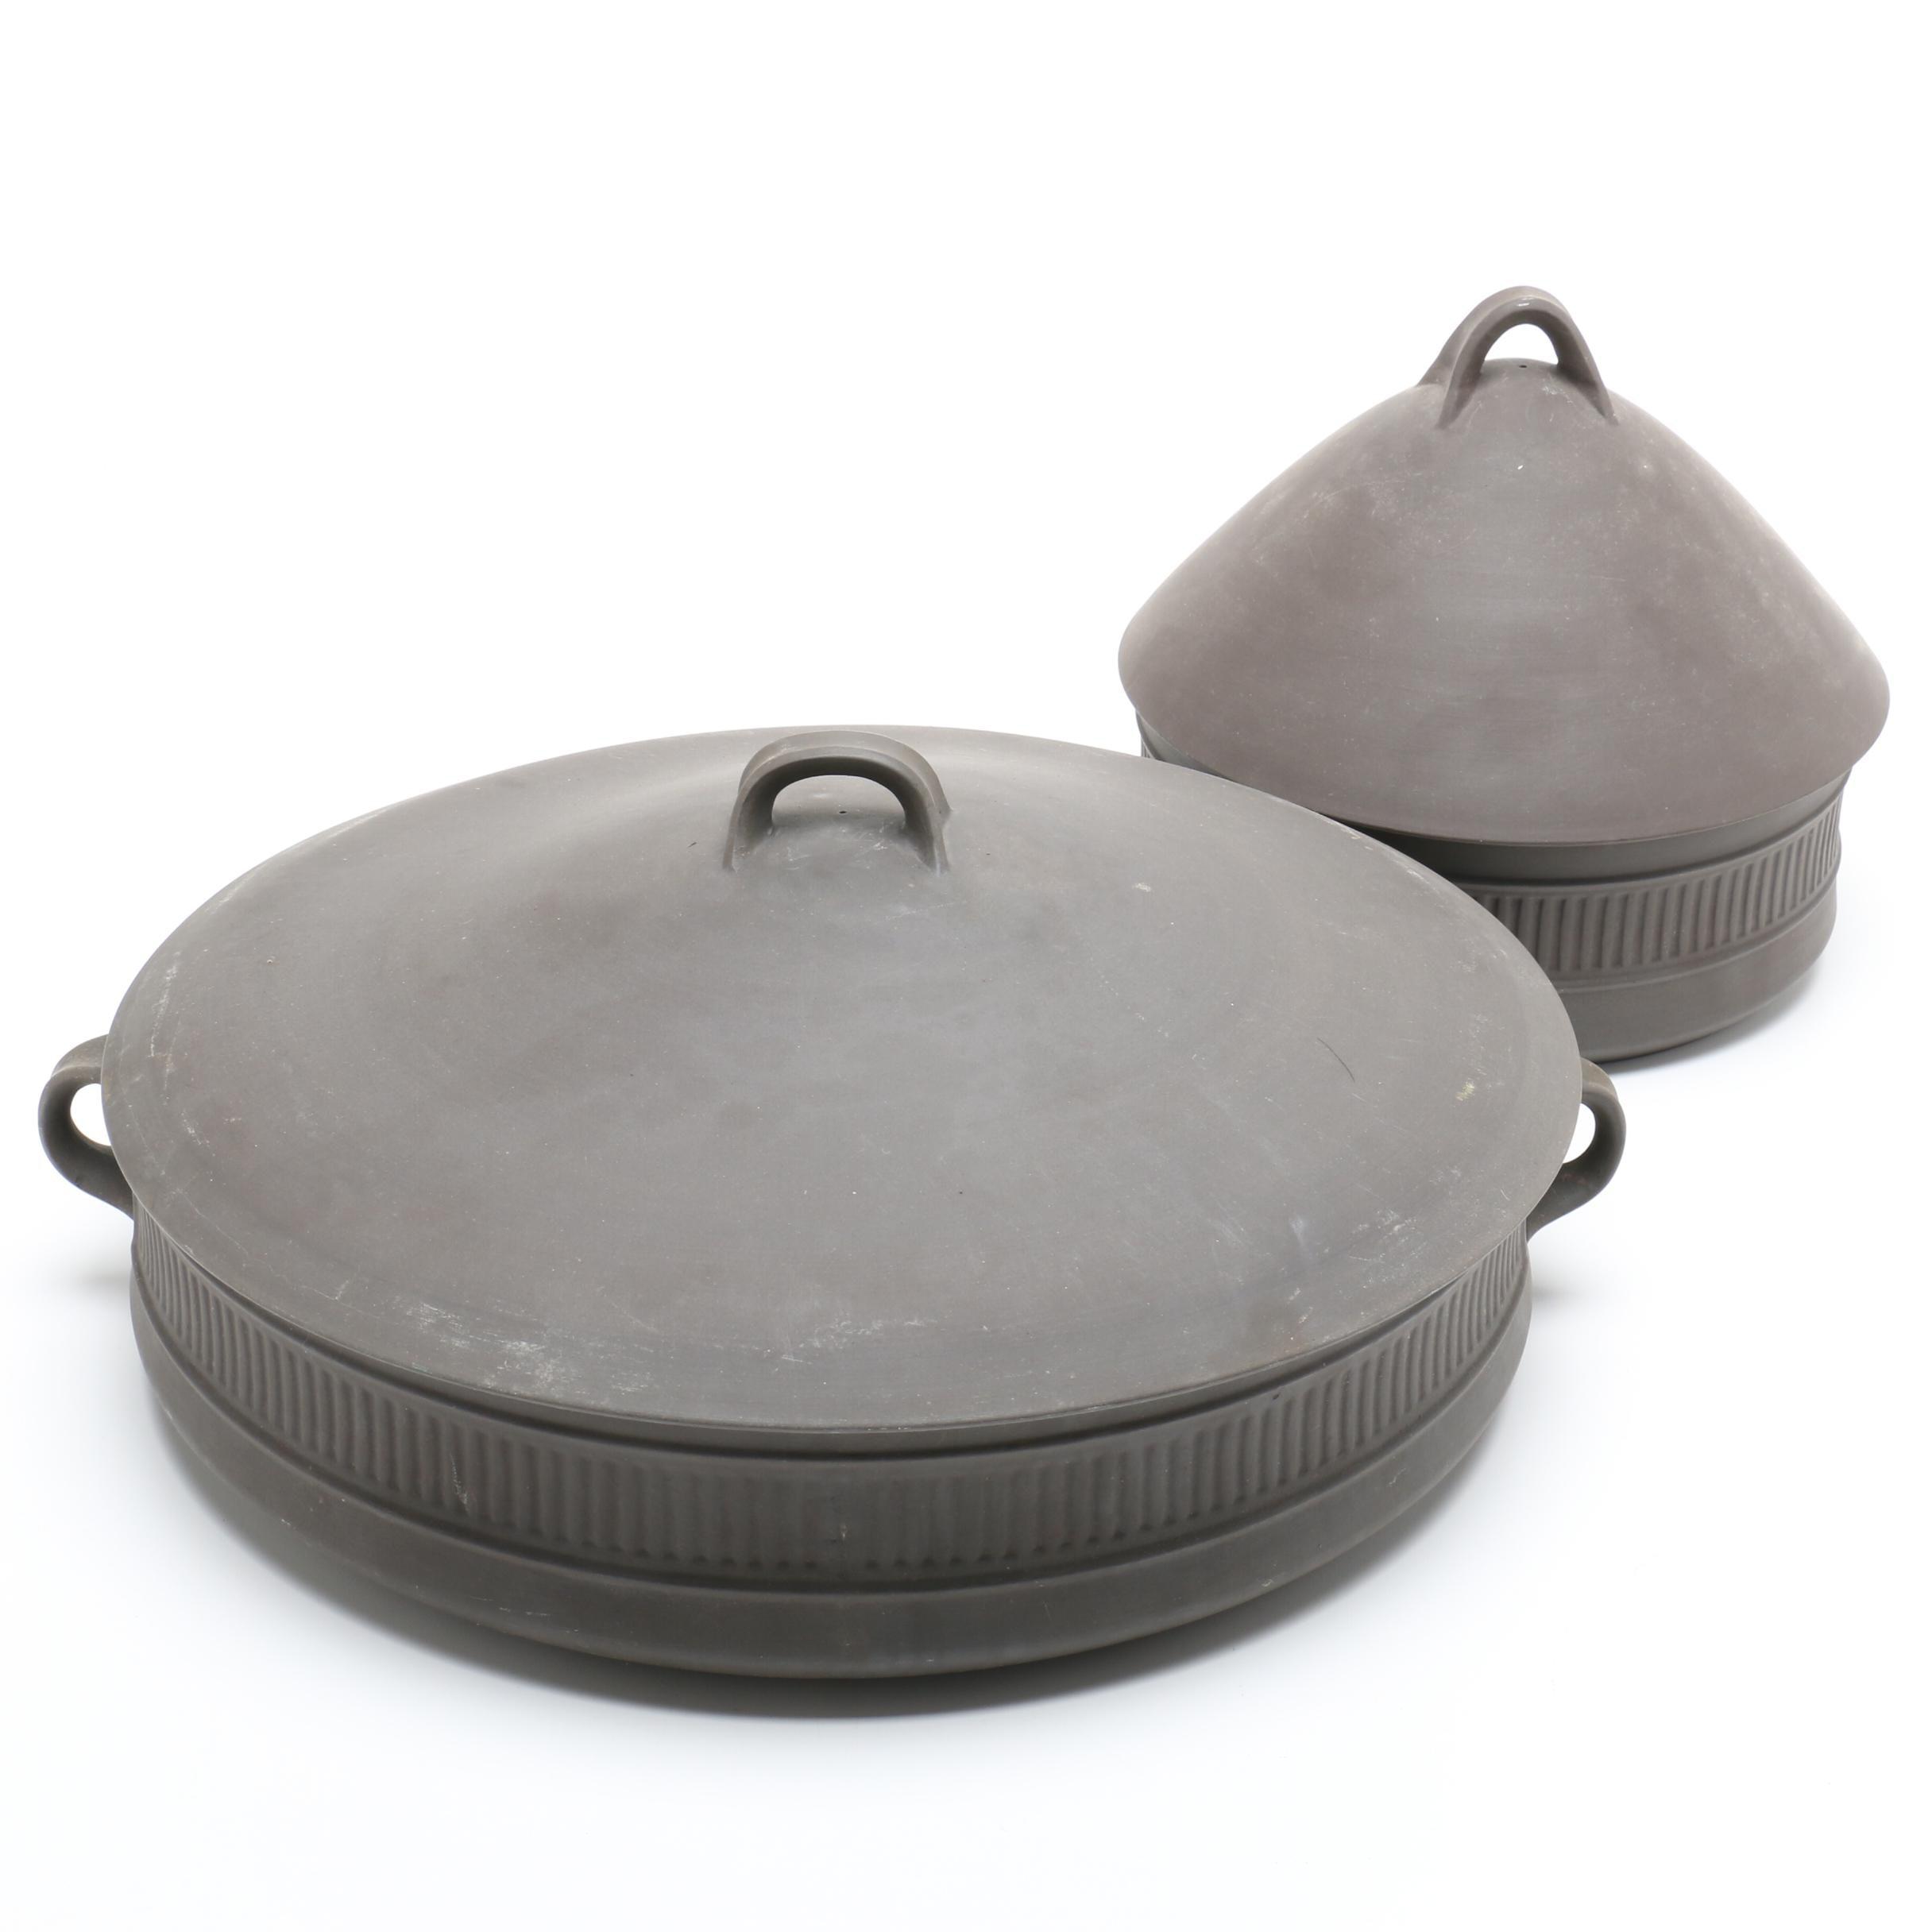 Vintage Dansk Denmark Flamestone Fluted and Round LIdded Casserole Dishes